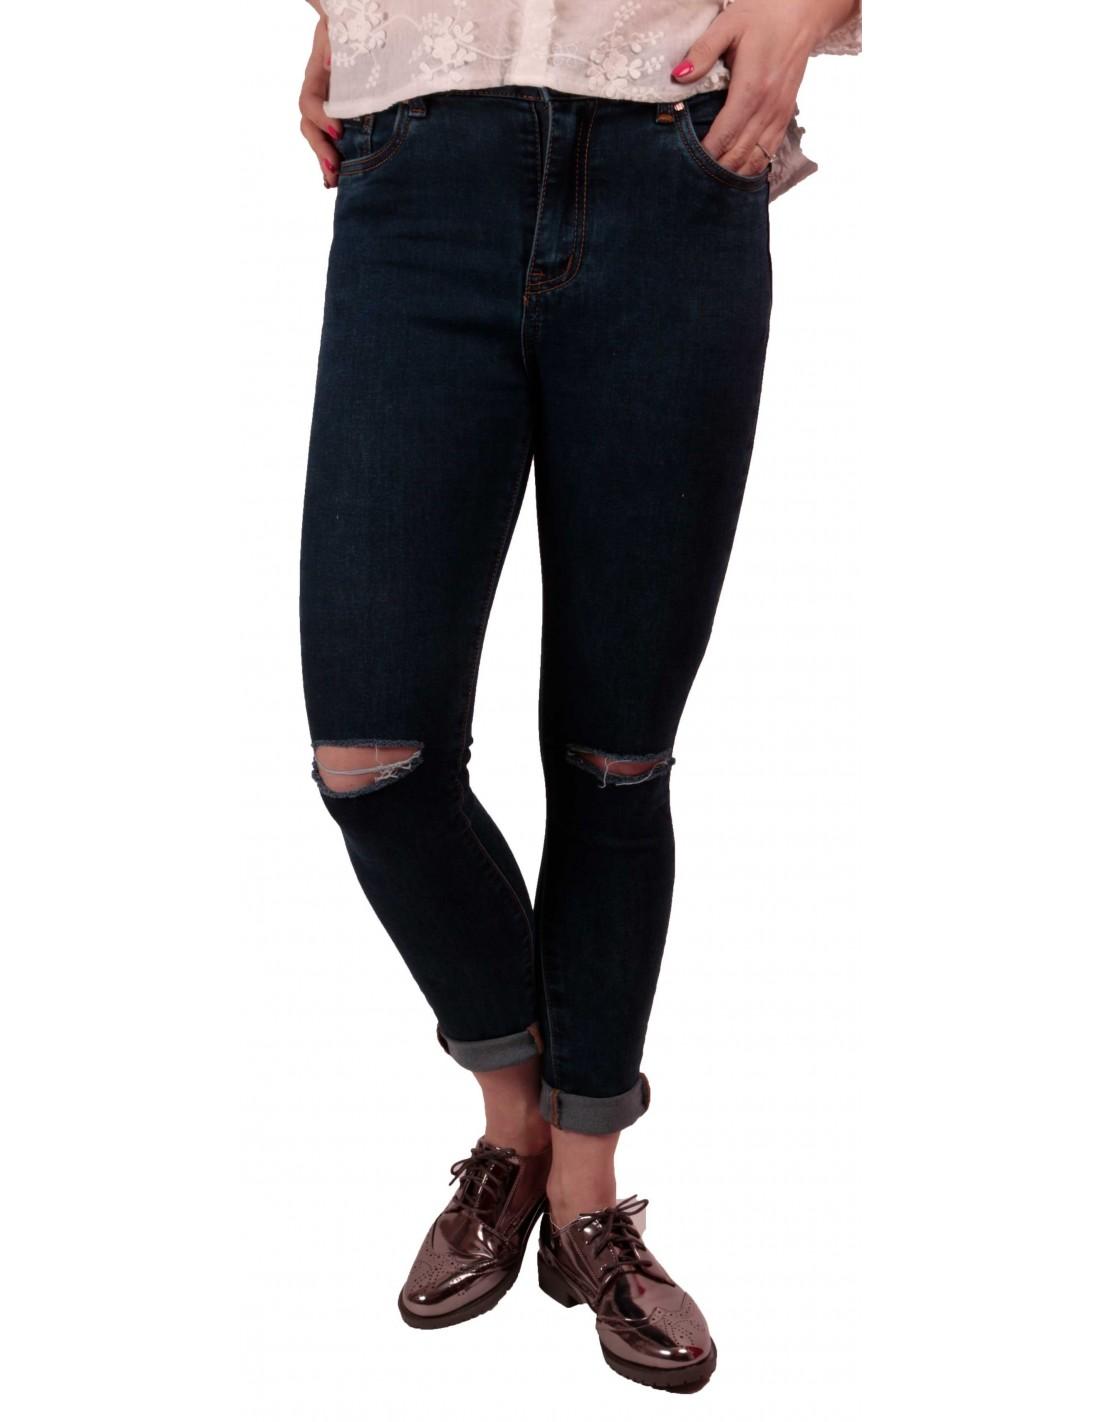 jean femme trou bleu brut taille haute stretch avec ourlets amovibles. Black Bedroom Furniture Sets. Home Design Ideas